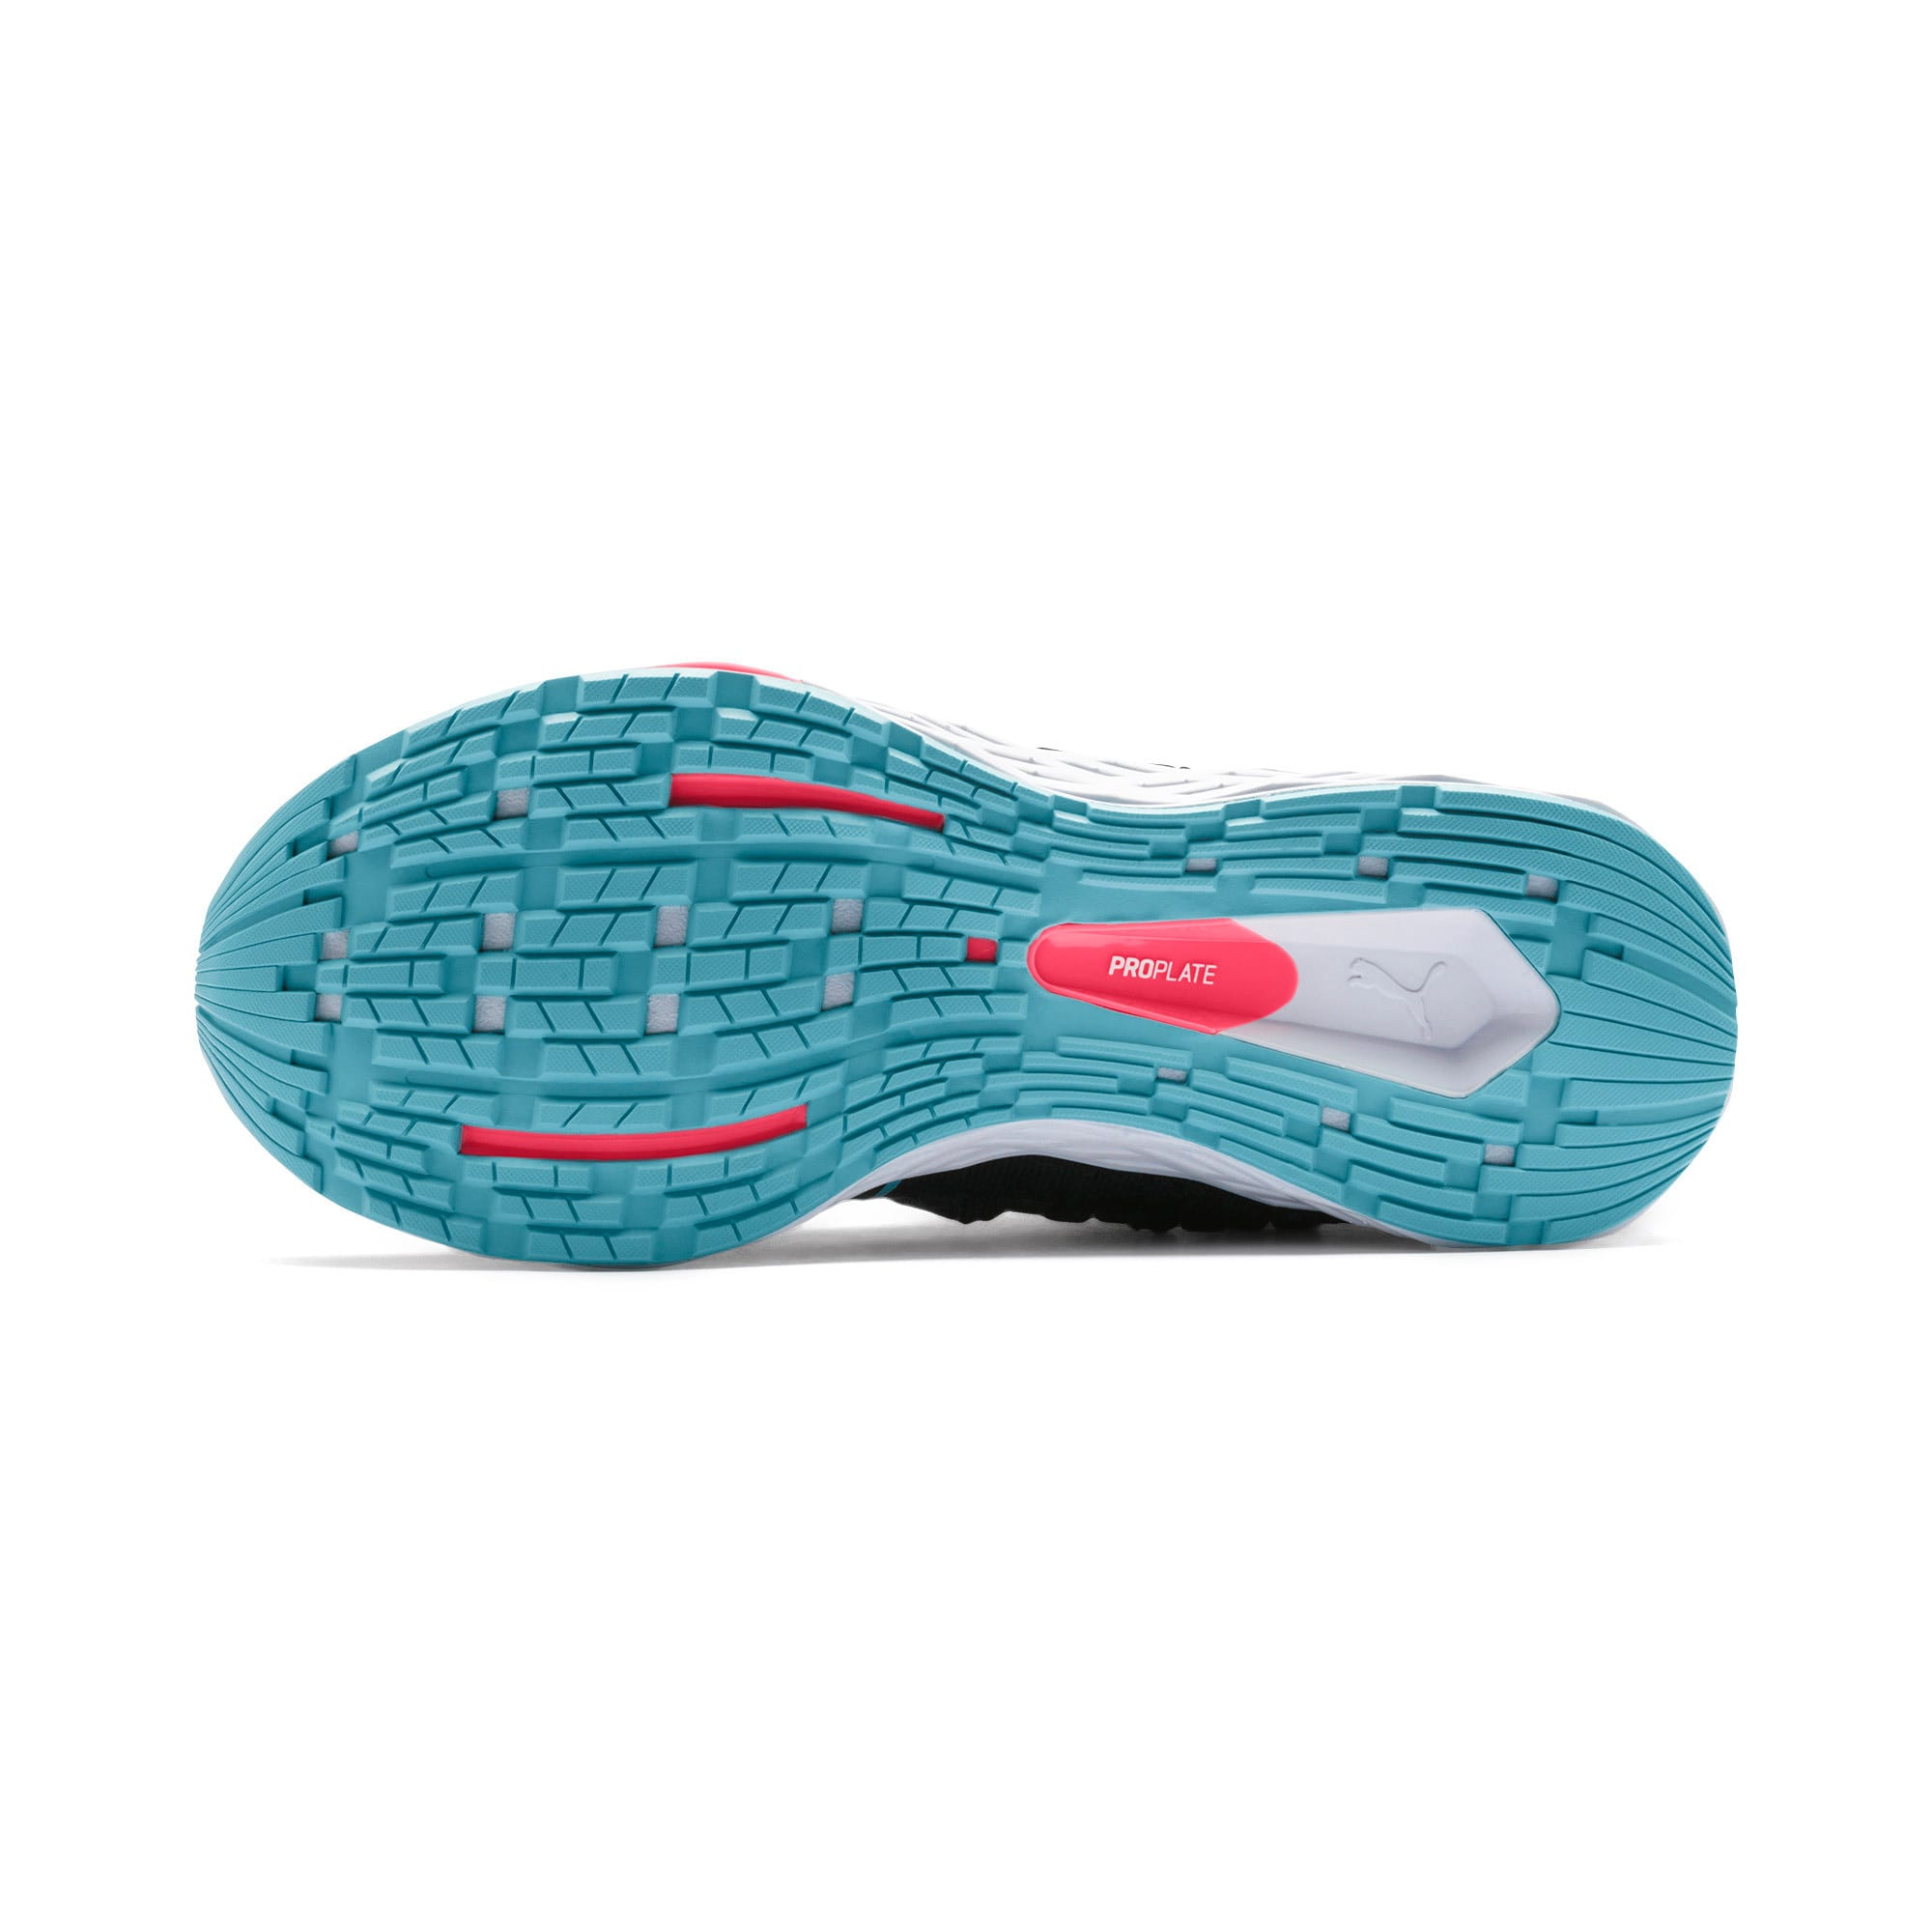 Thumbnail 5 of SPEED RACER Women's Running Shoes, Black-Milky Blue-Pink Alert, medium